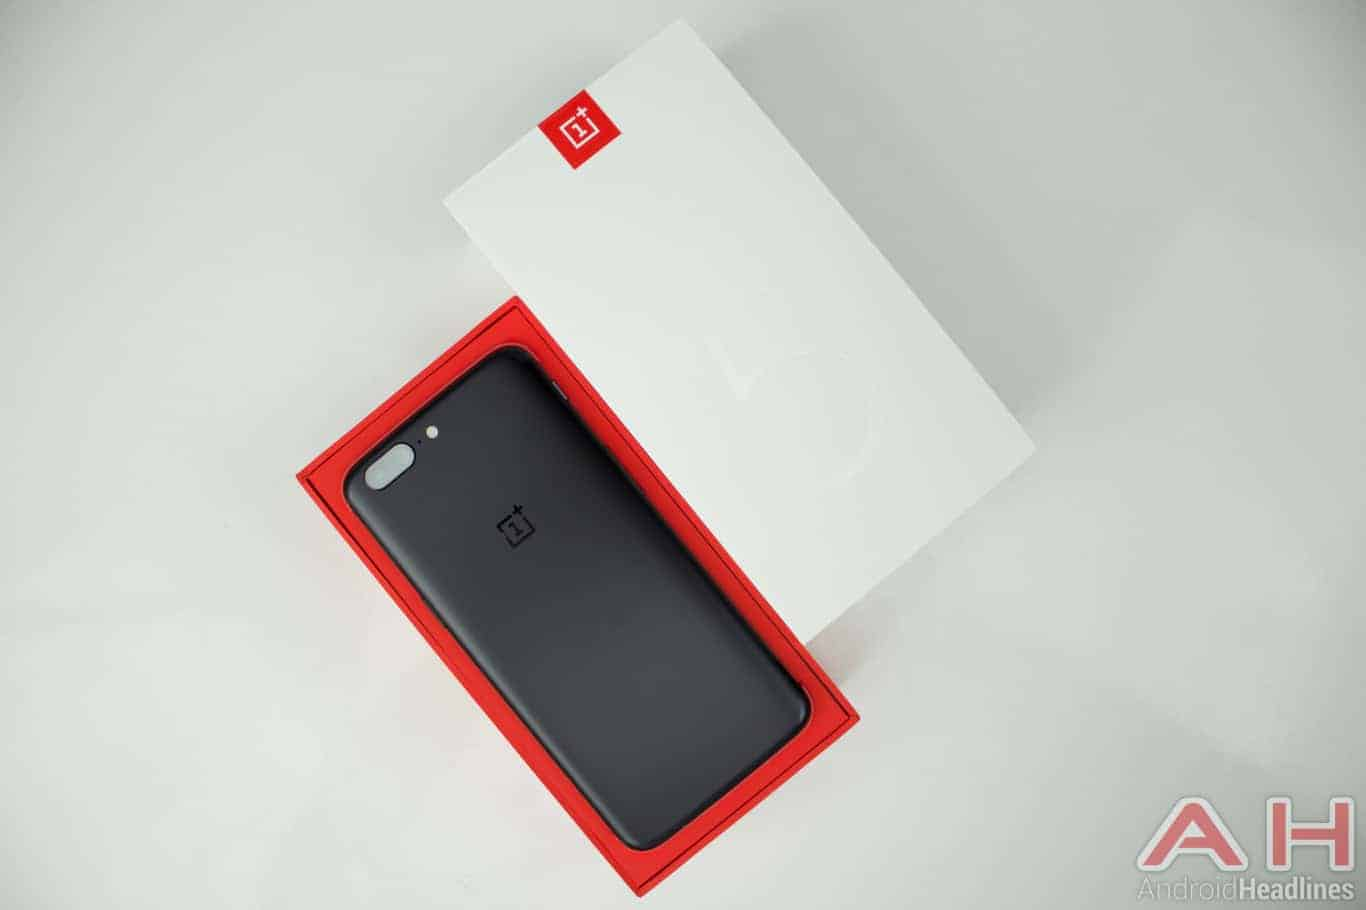 OnePlus 5 AH NS 01